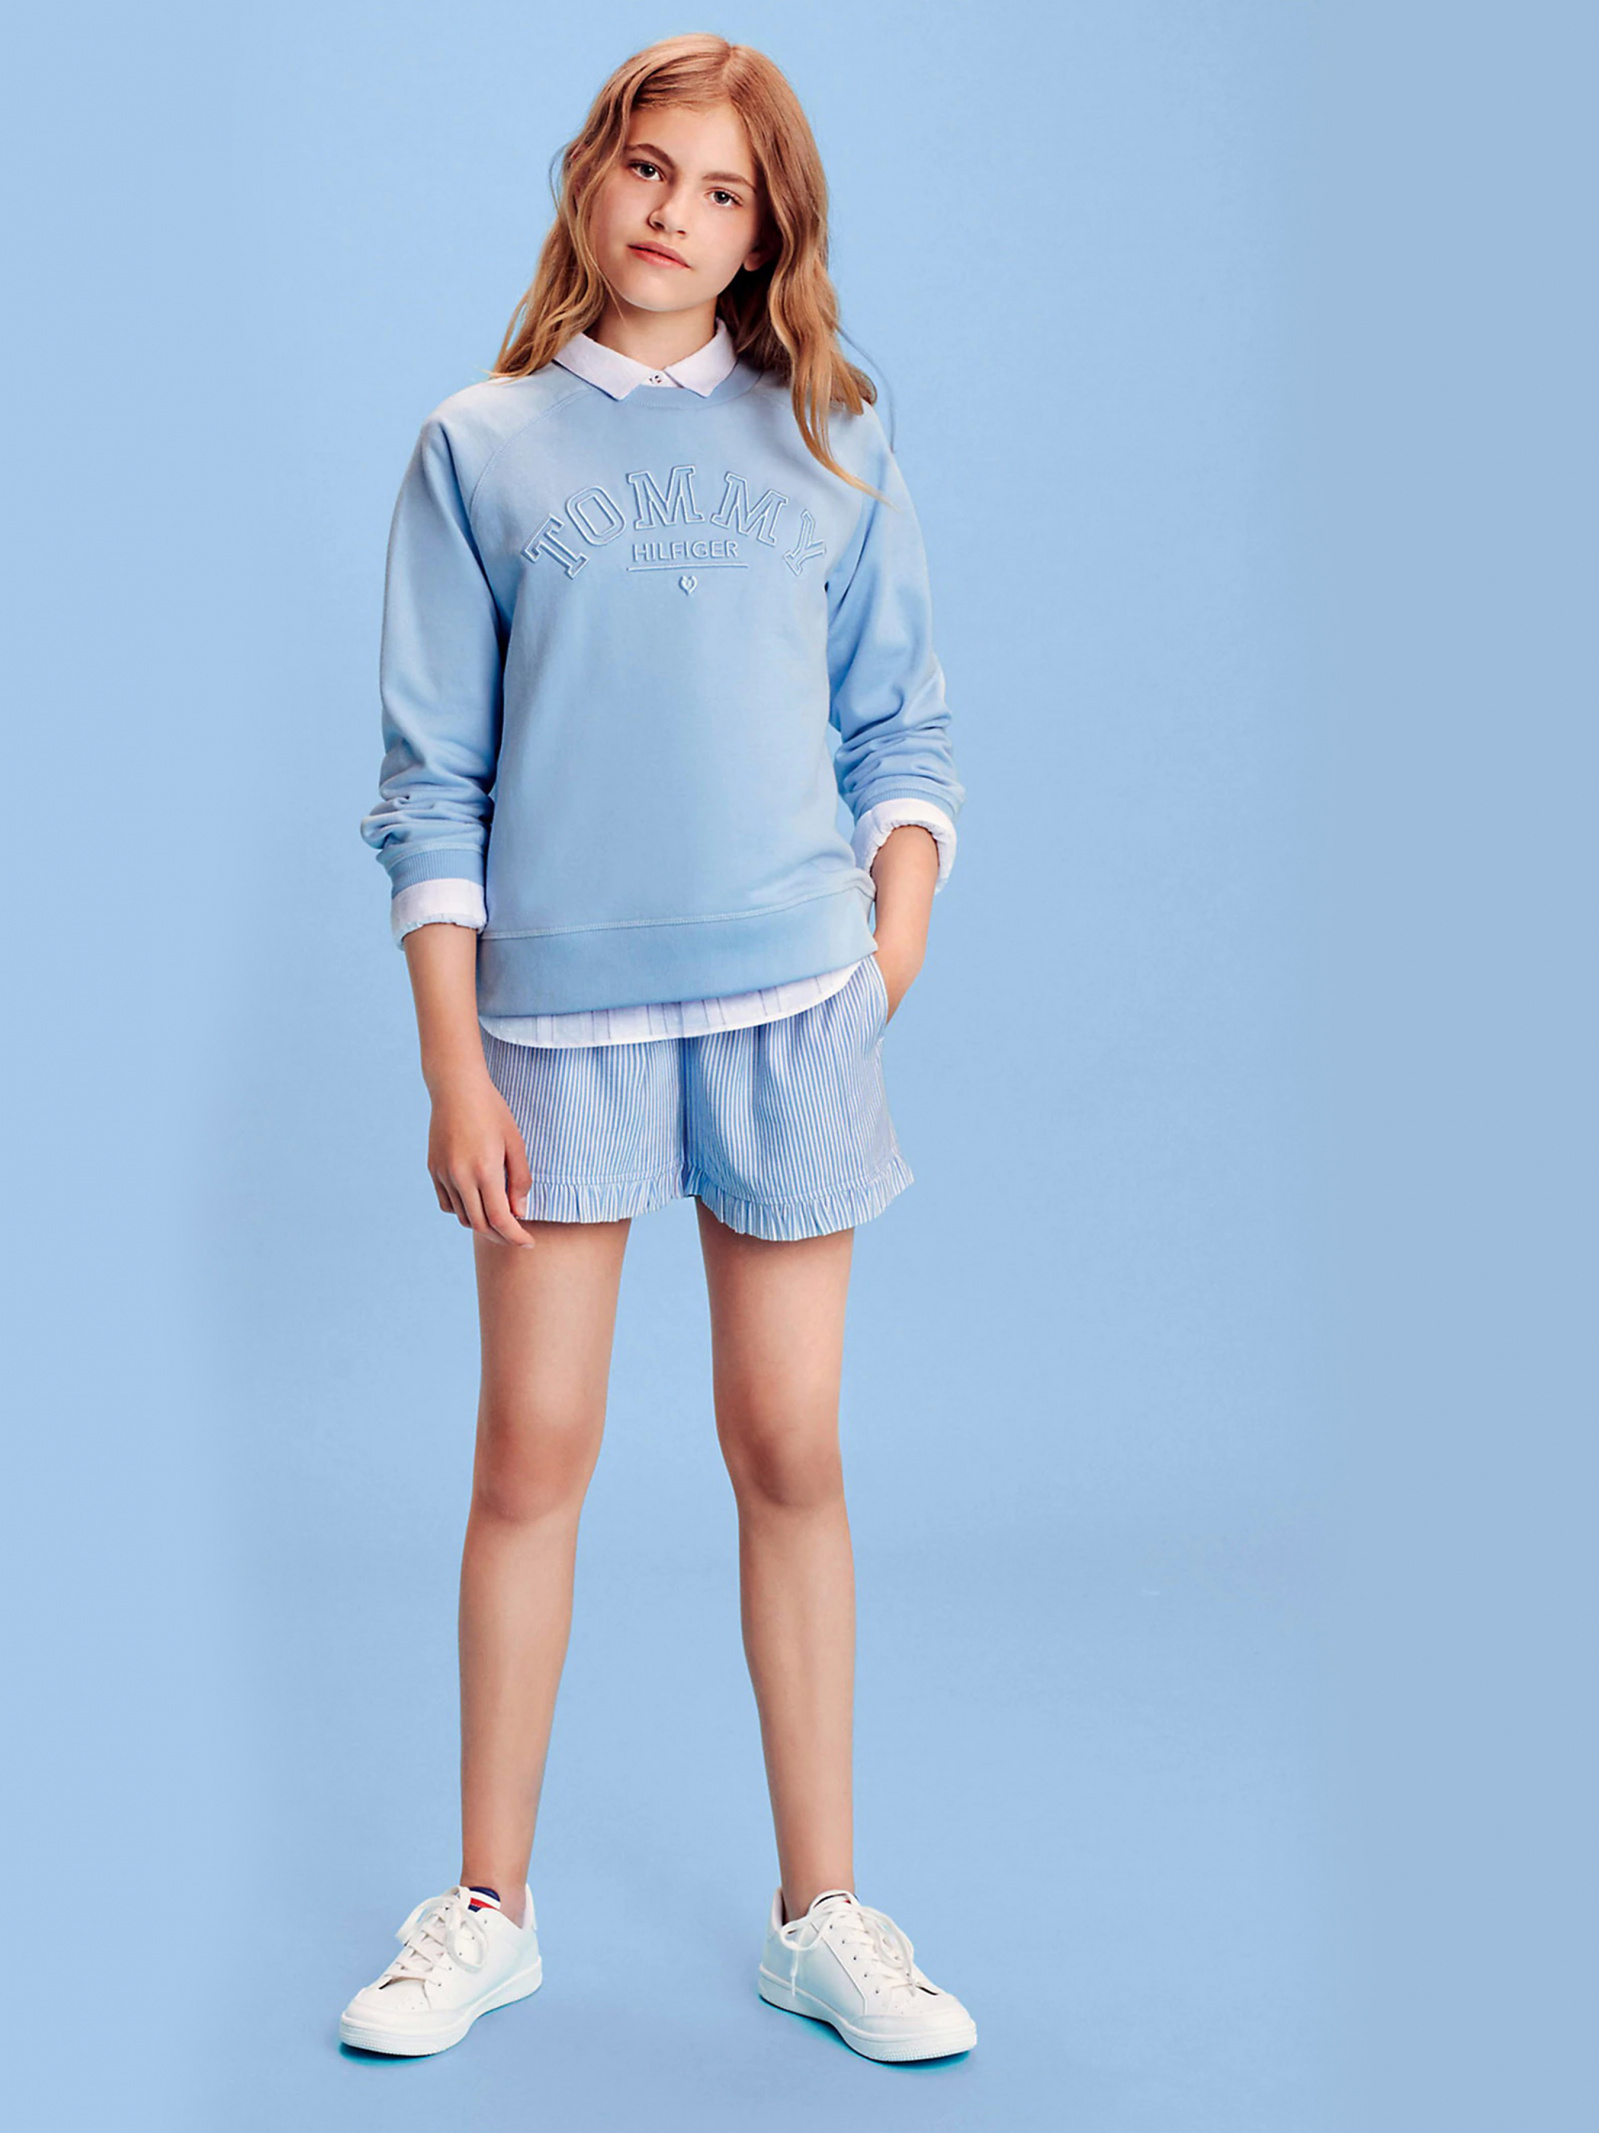 Tommy Hilfiger Кофти та светри дитячі модель KG0KG05167-C1S ціна, 2017